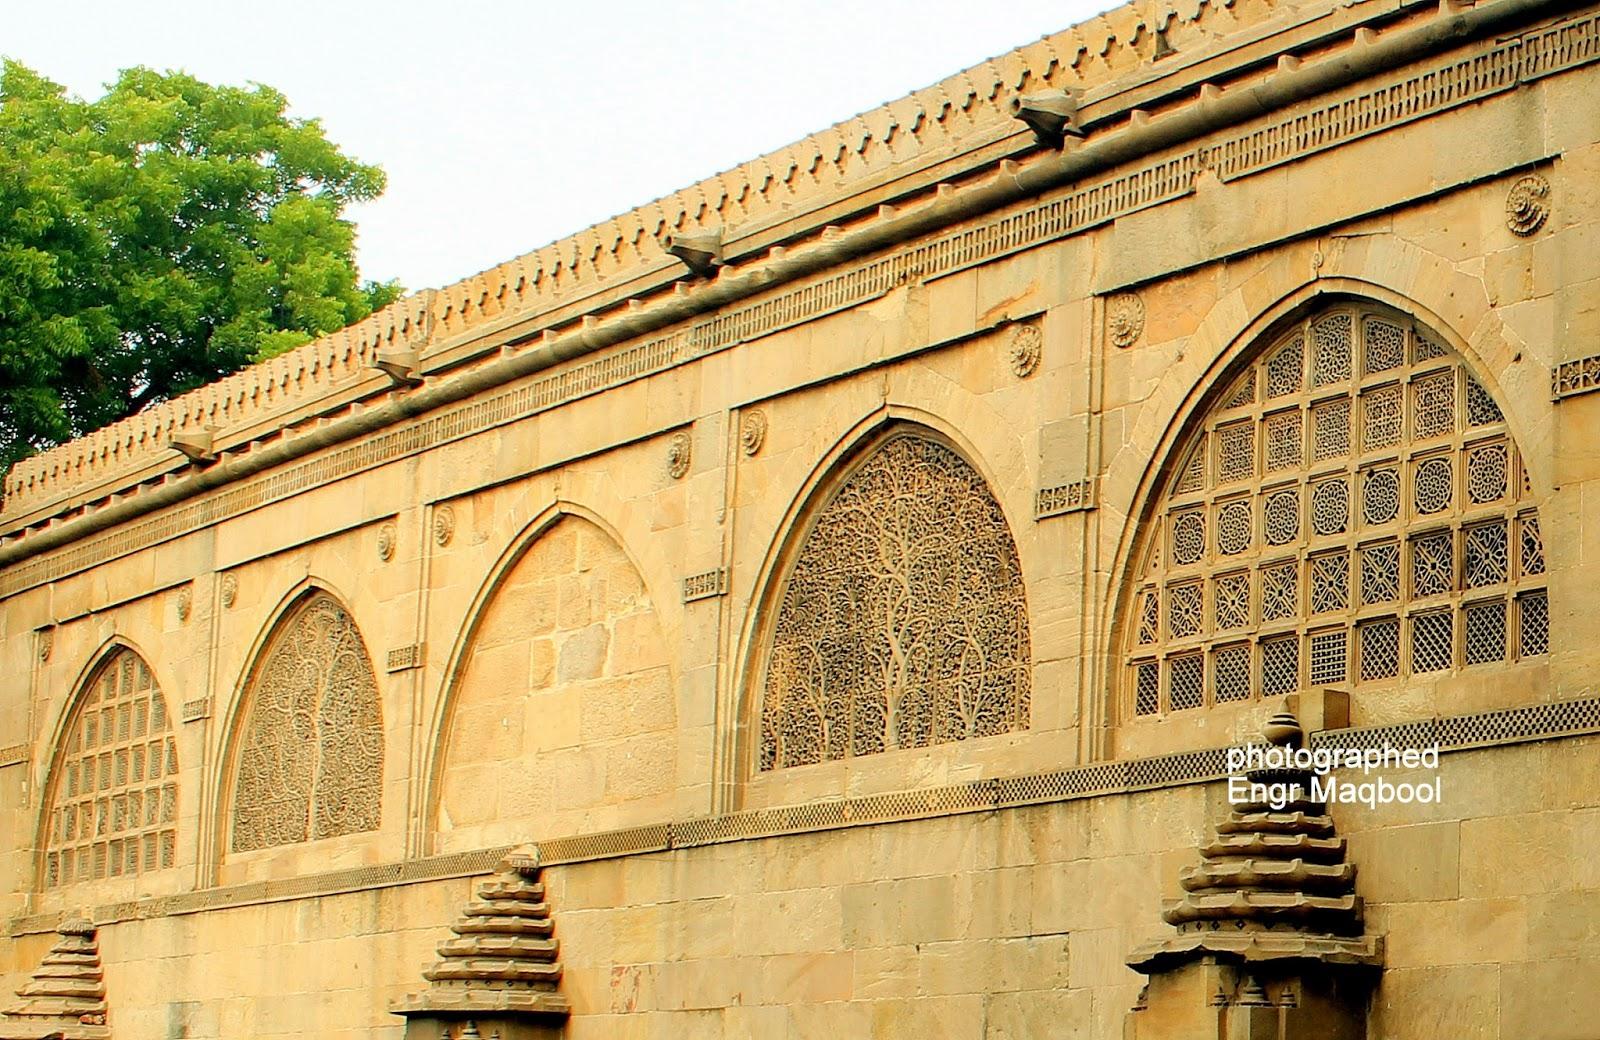 The passion s of engr maqbool akram jhoolta minar